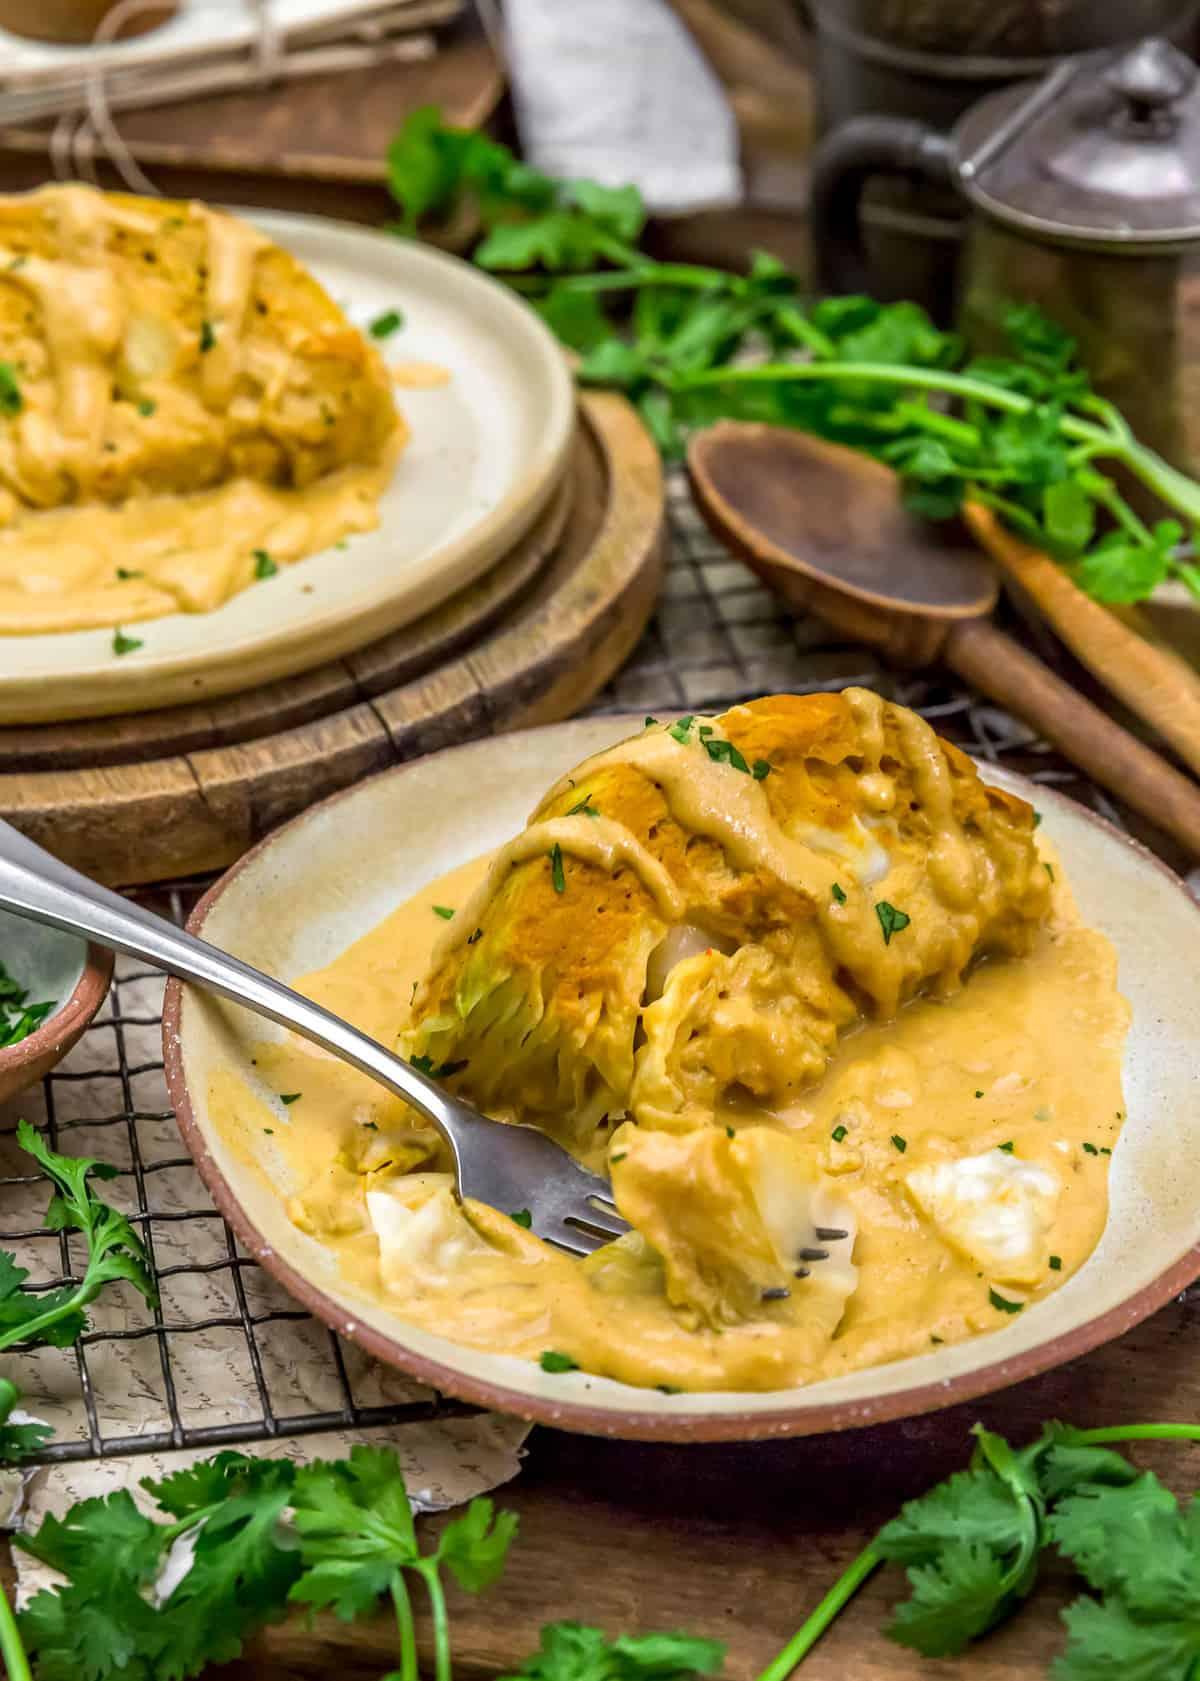 Plated Vegan Southwestern Scalloped Cabbage